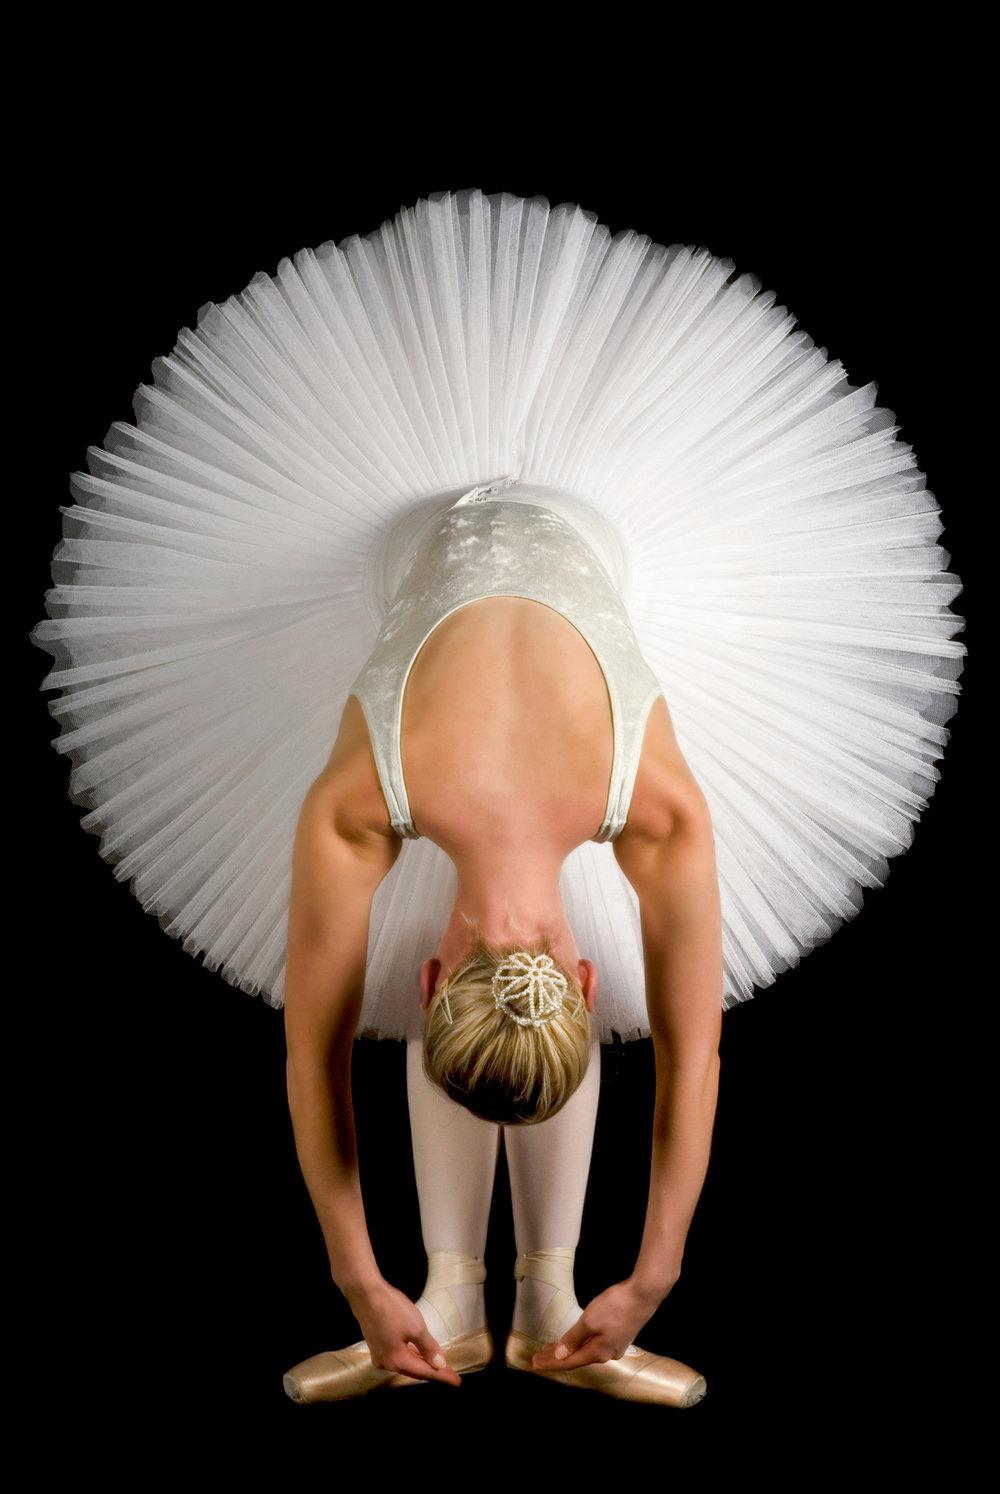 Ballerina London, England